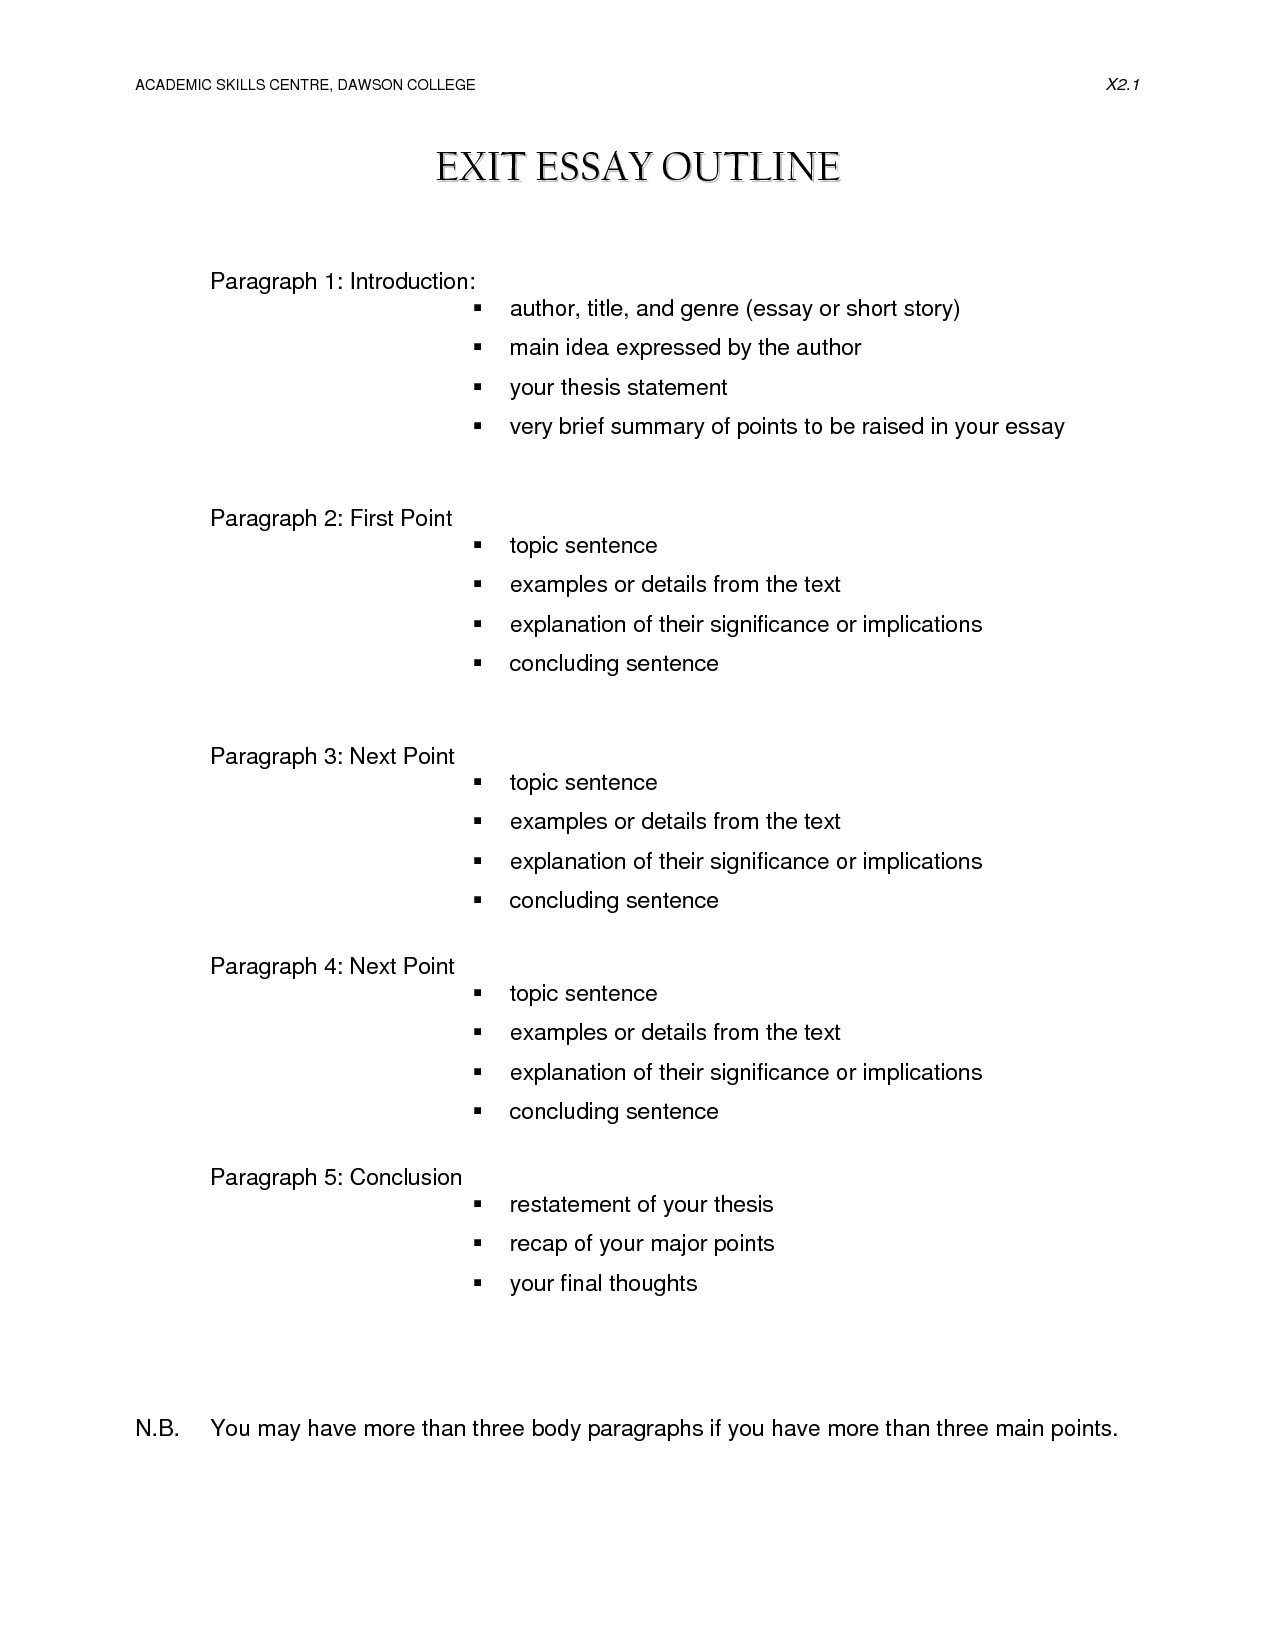 Apa formal Outline 16 Best Of College Essay Writing Worksheet Essay